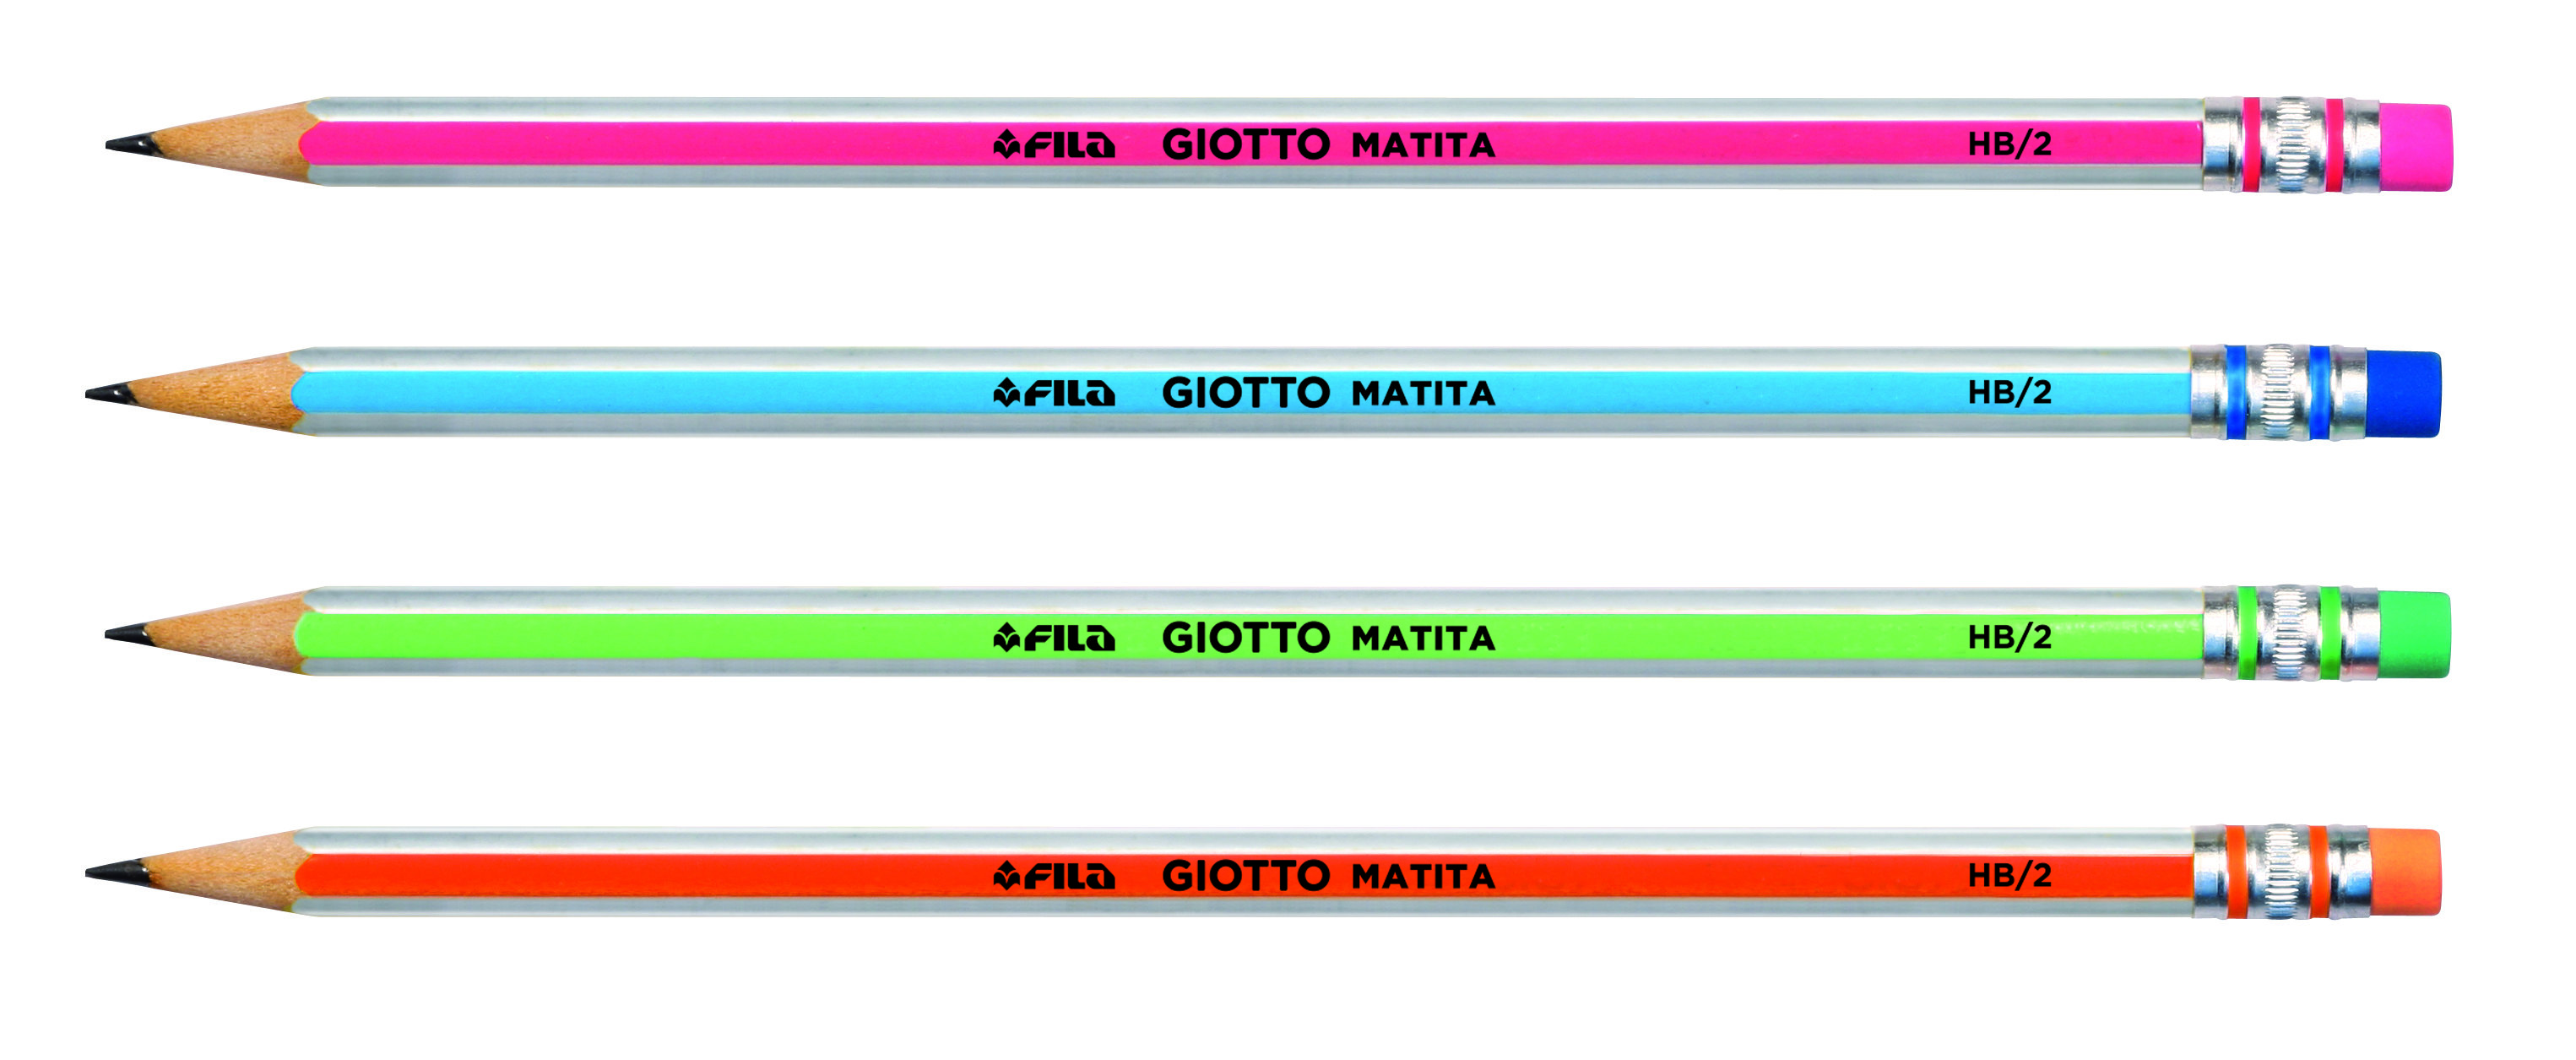 Lápiz de grafito con goma Giotto Matita 233200